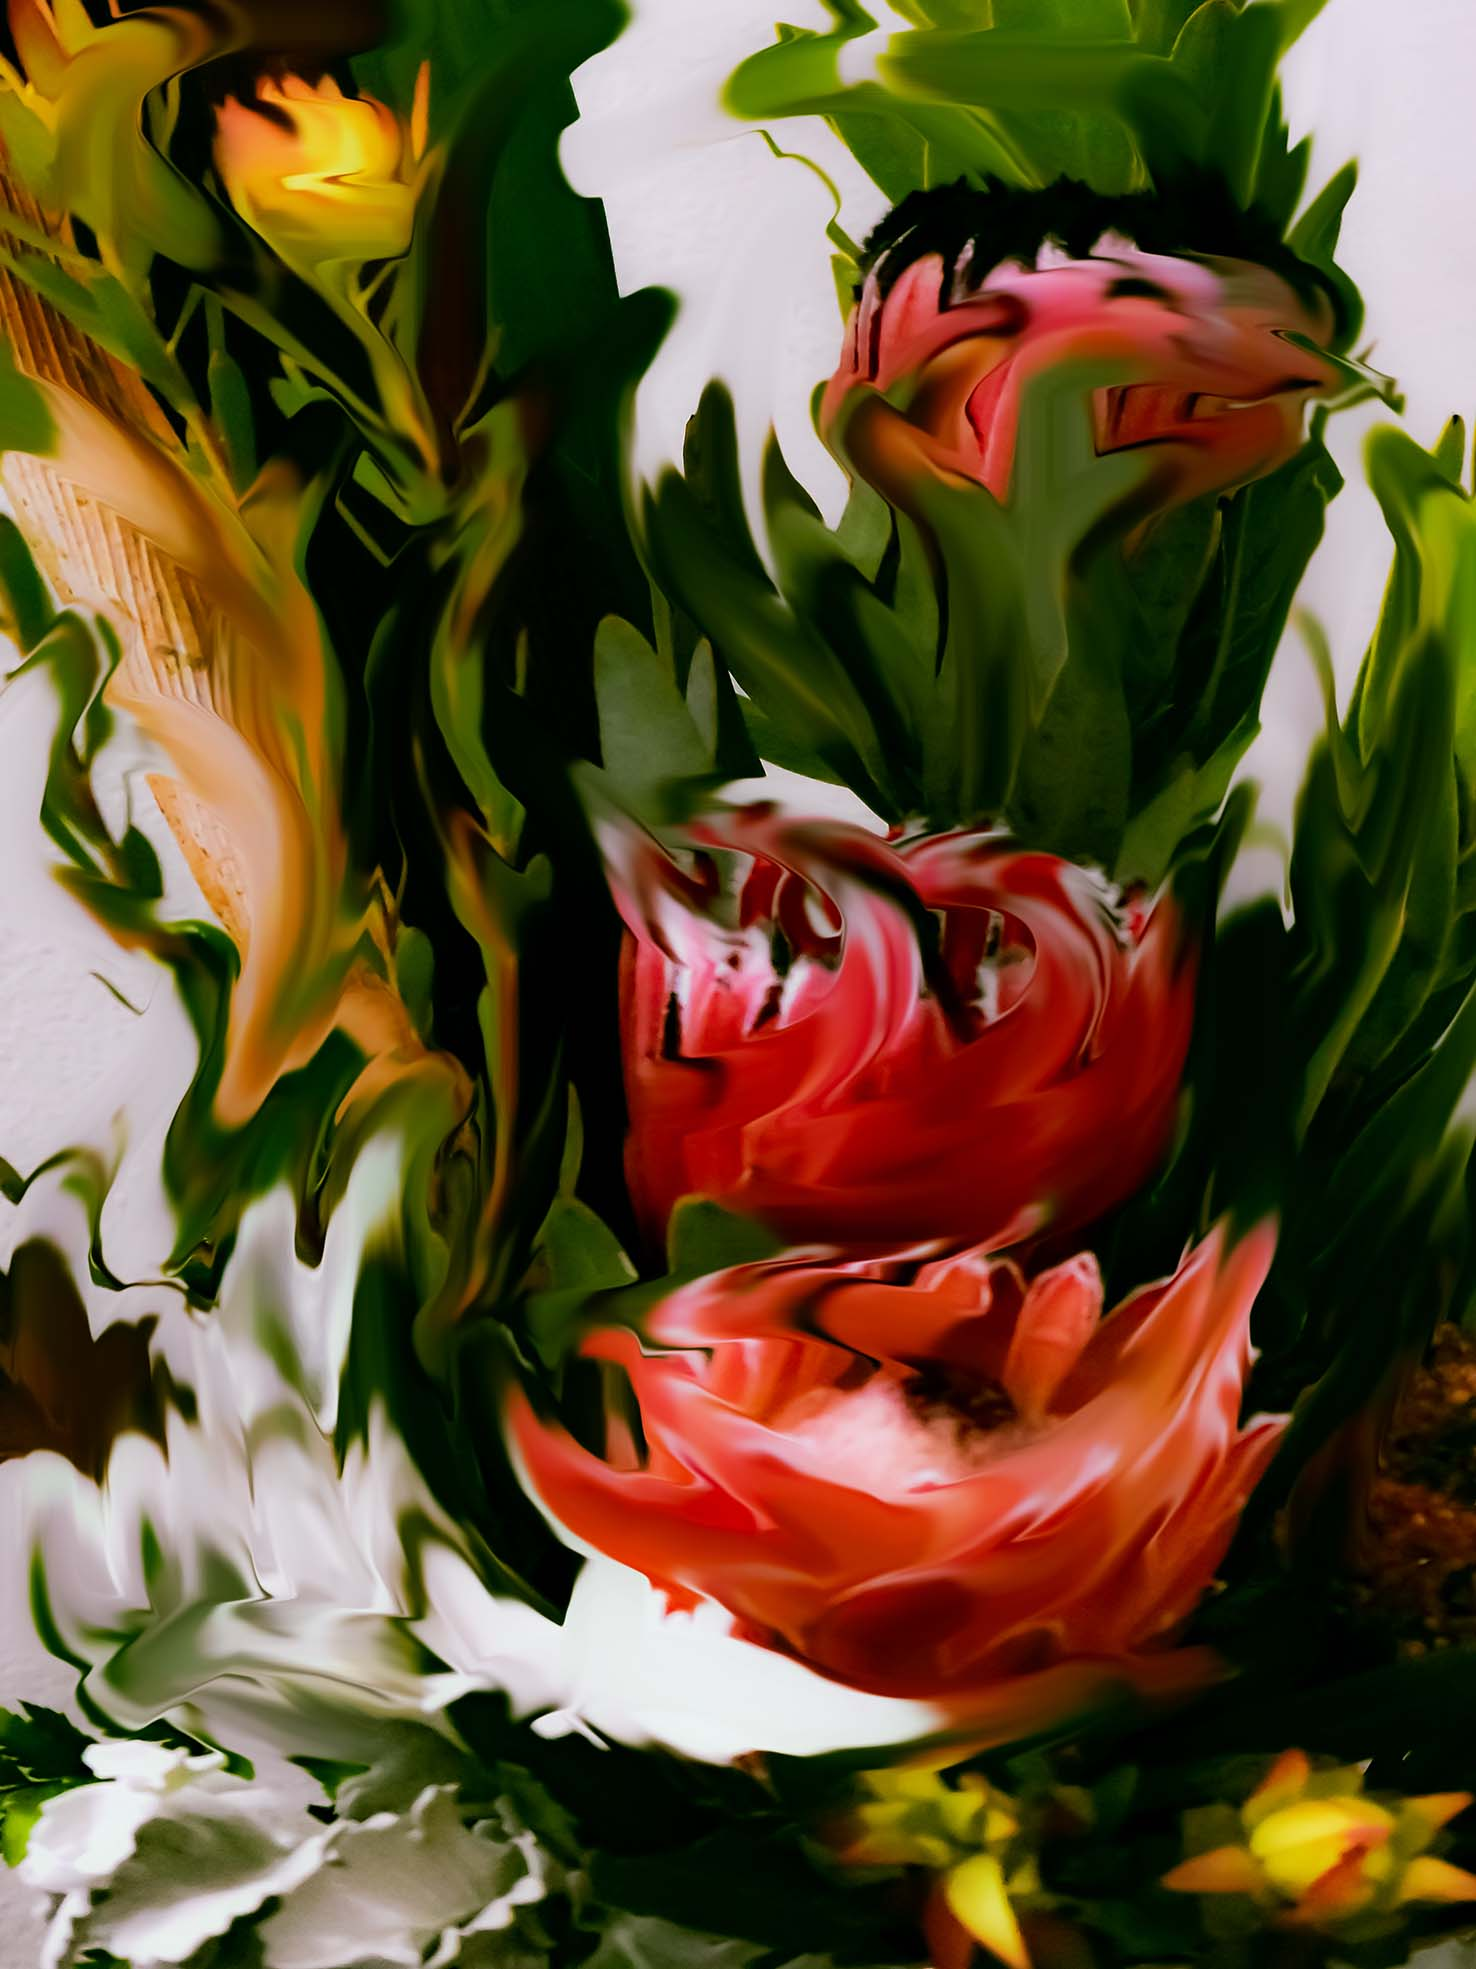 © Bernadette Heald | This Season Through Different Eyes